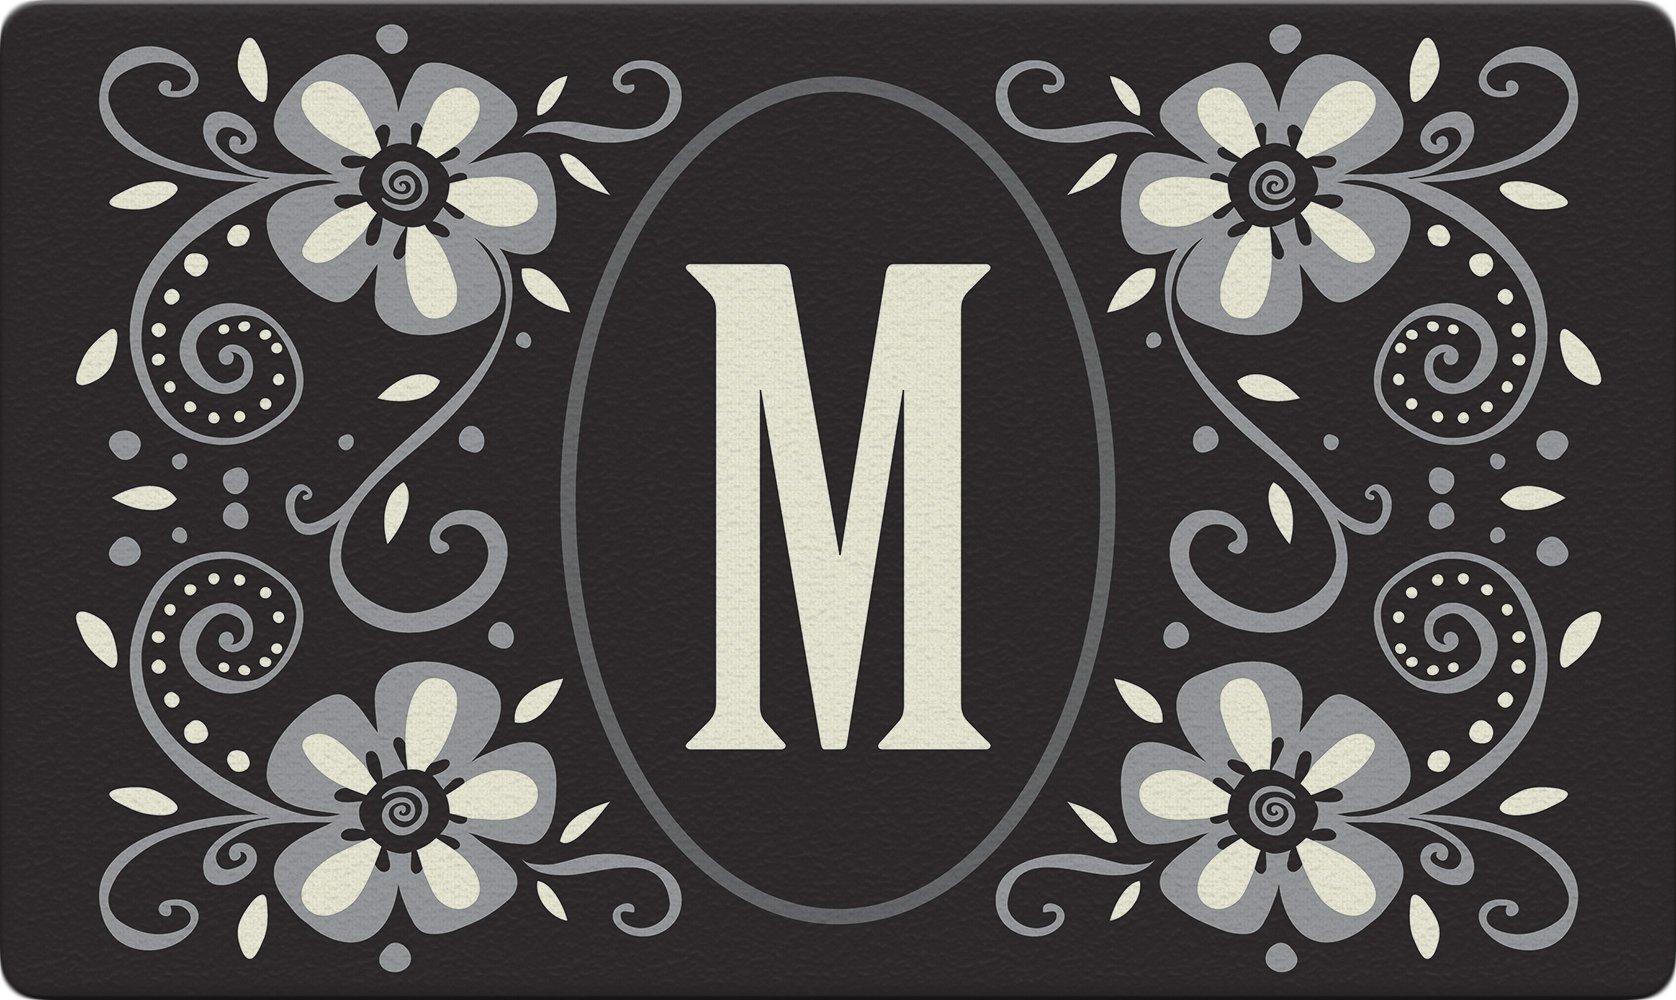 Toland Home Garden Classic Monogram M 18 x 30 Inch Decorative Floor Mat Flower Design Pattern Doormat